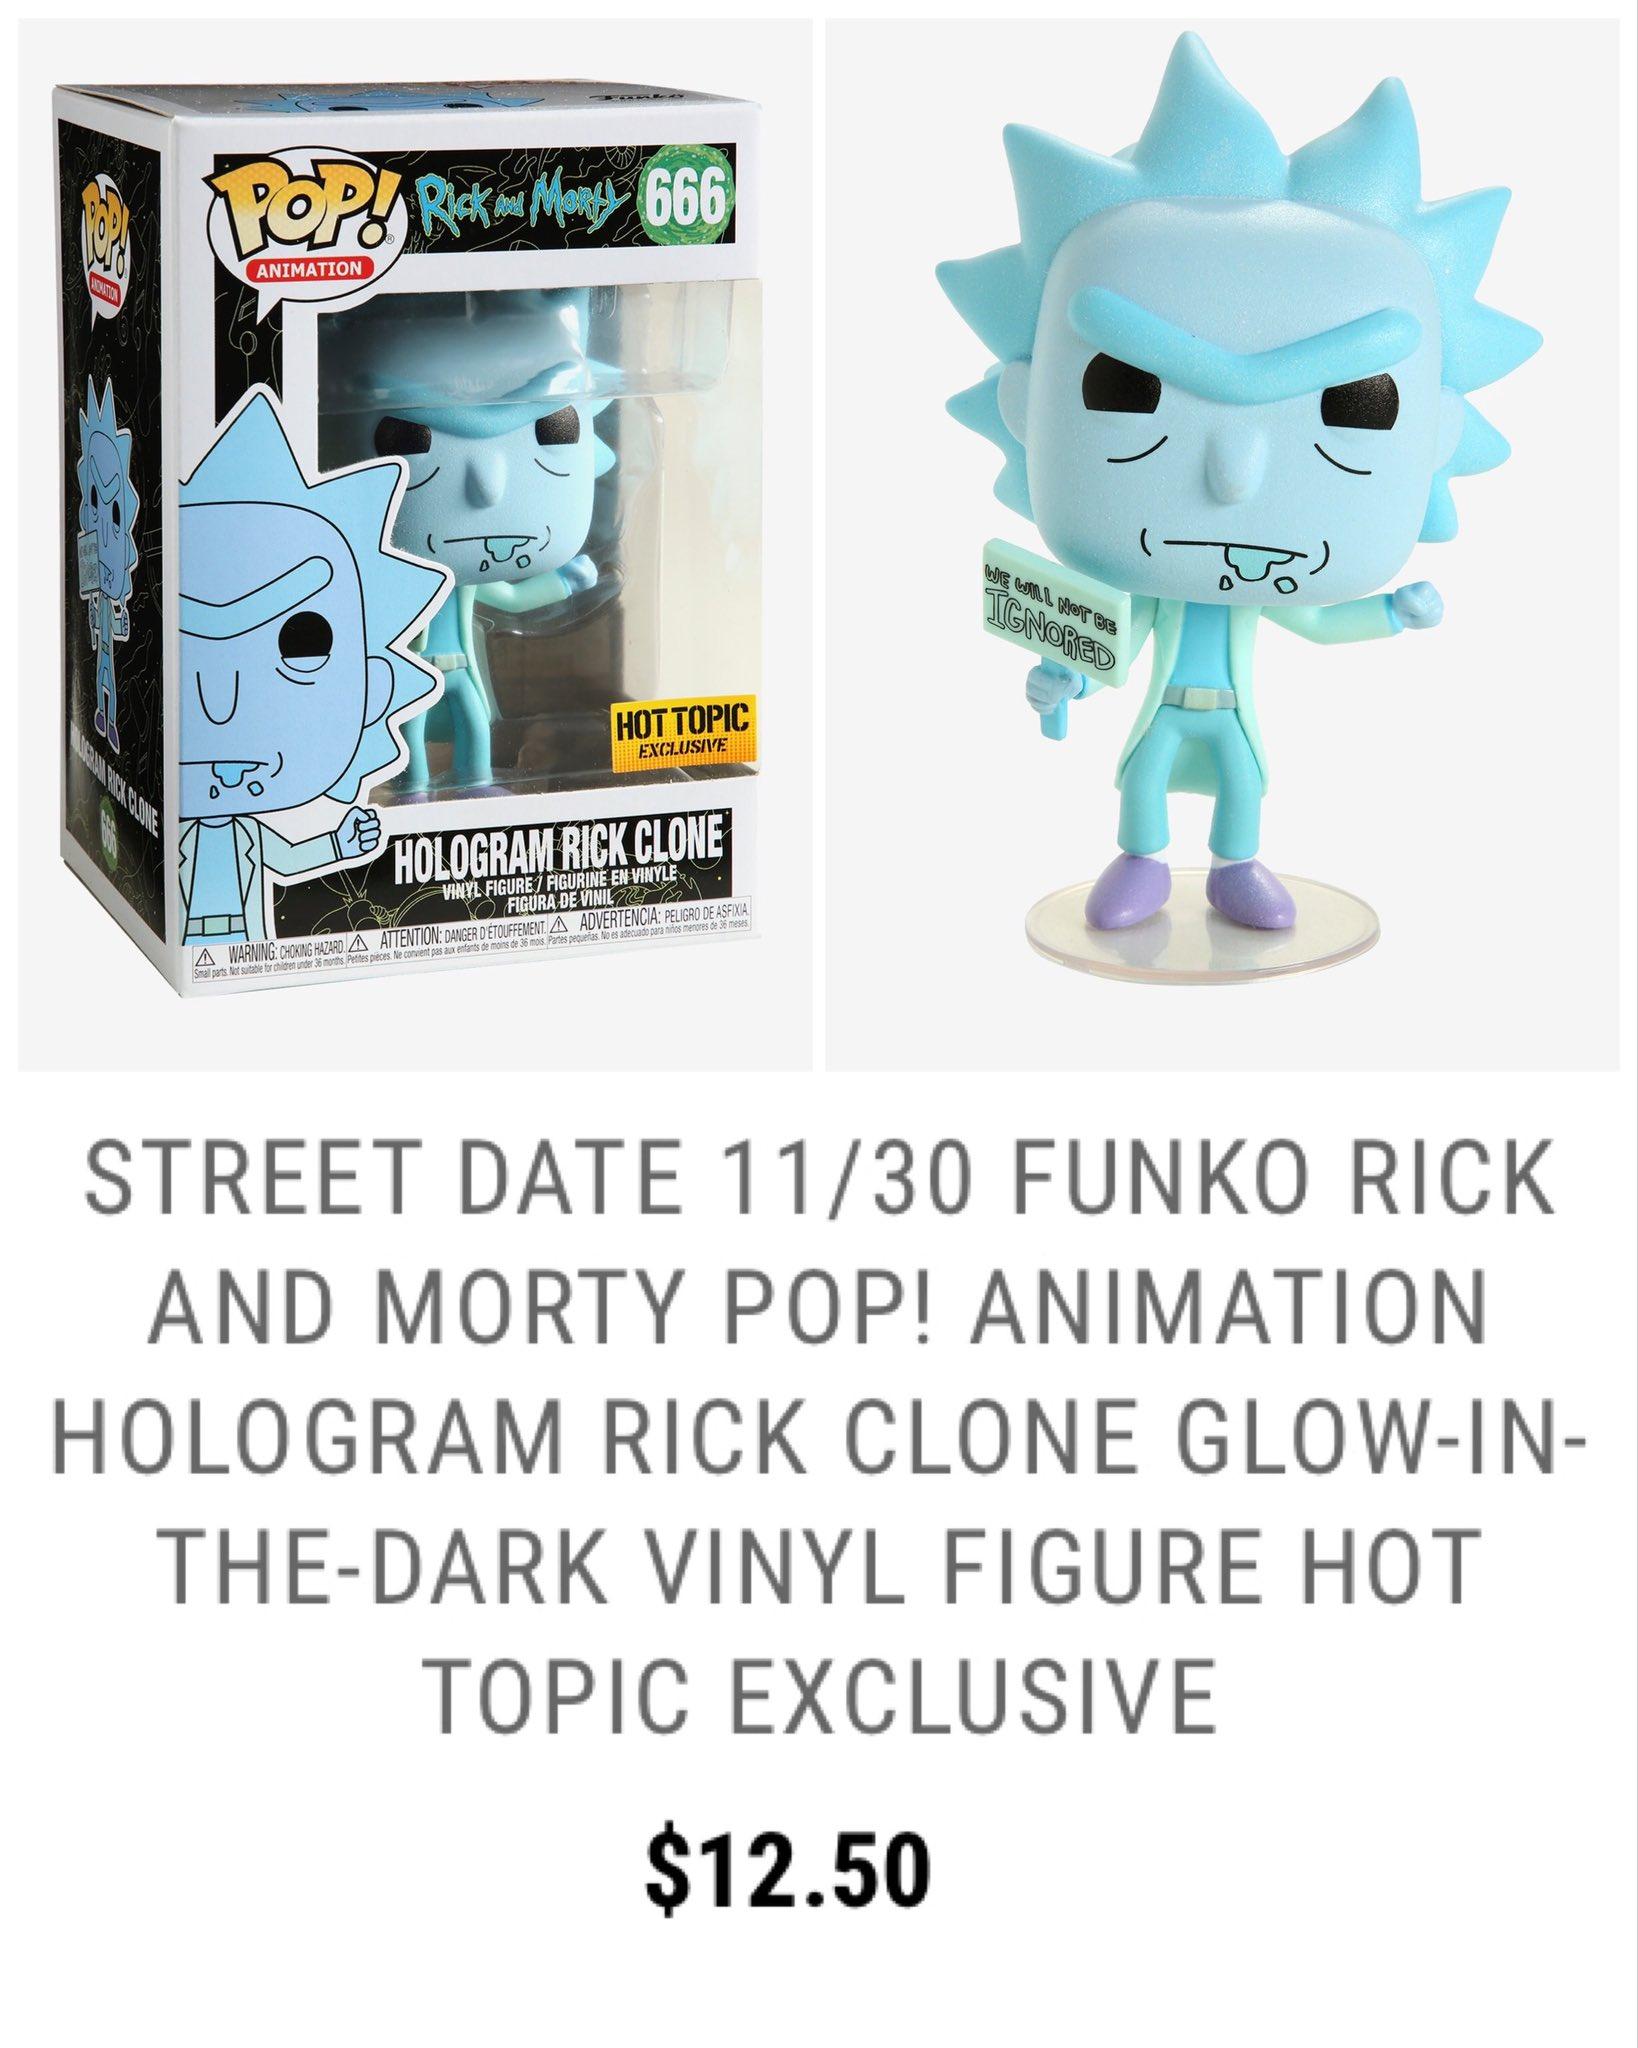 Hologram Rick Clone Funko Pop Vinyl Rick and Morty Hot Topic Exclusive GITD